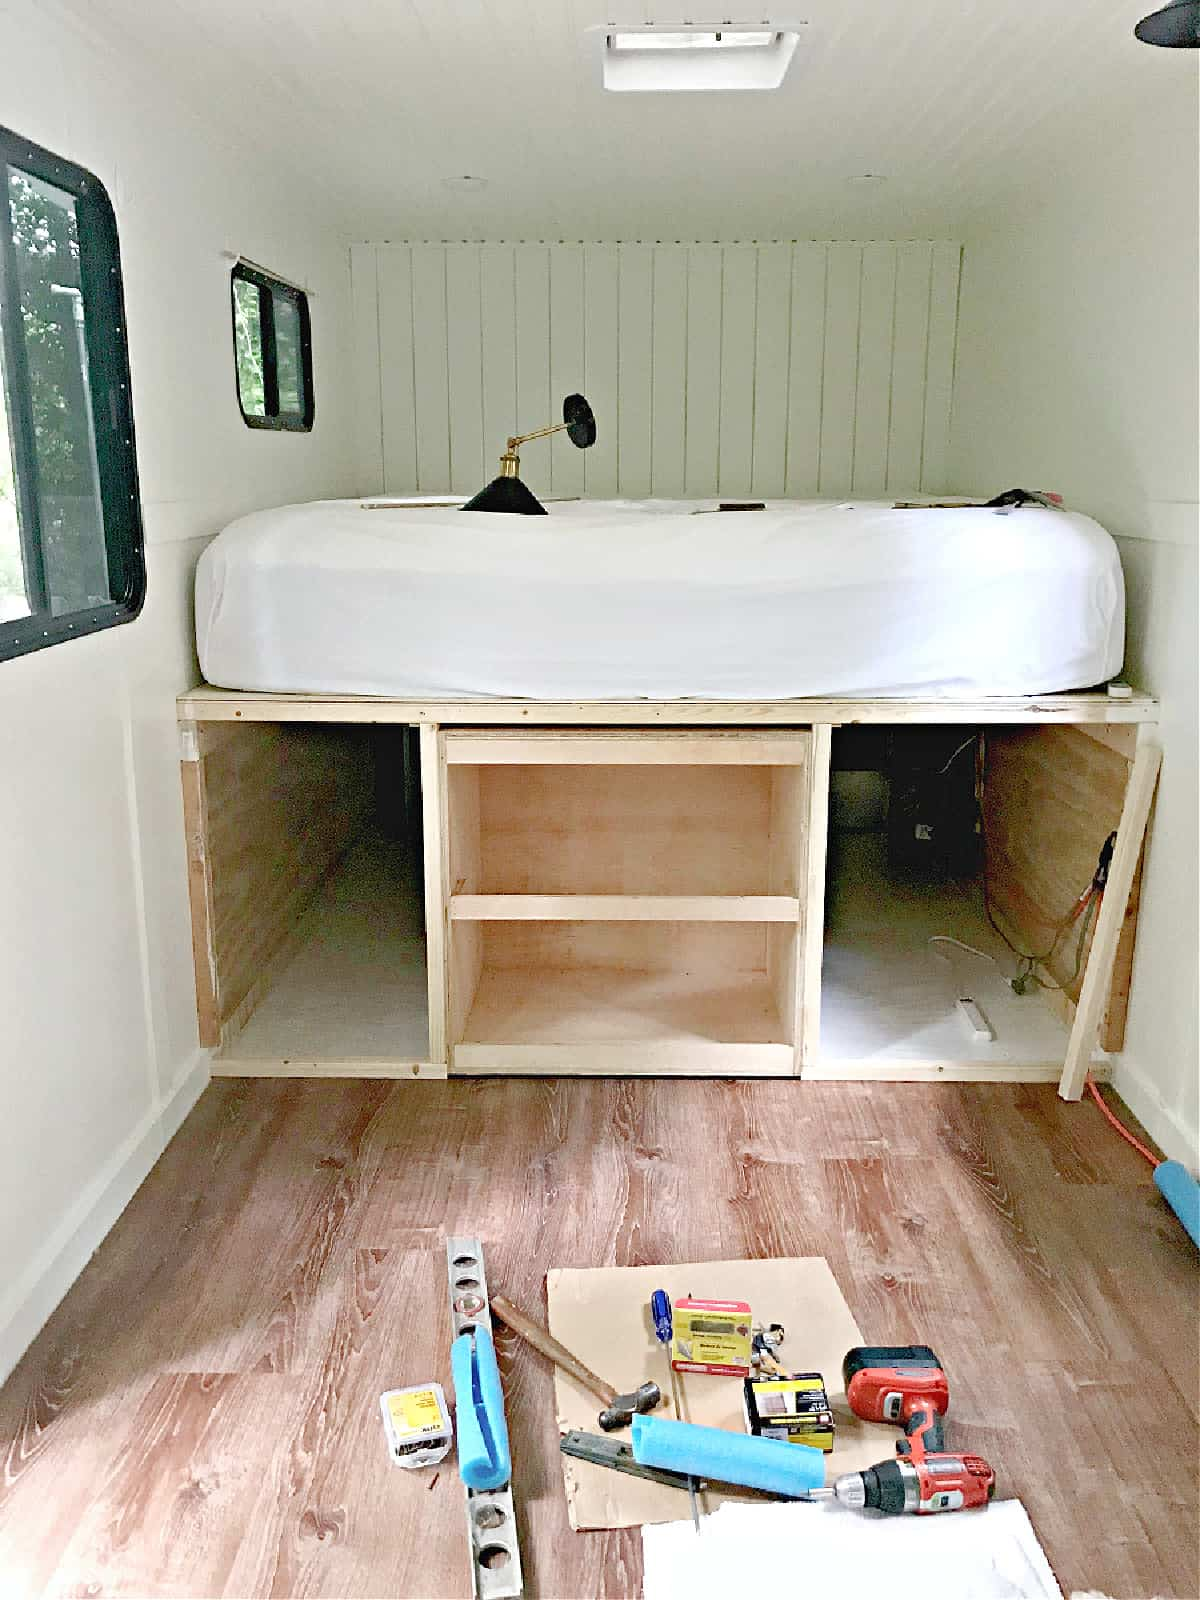 RV platform bed